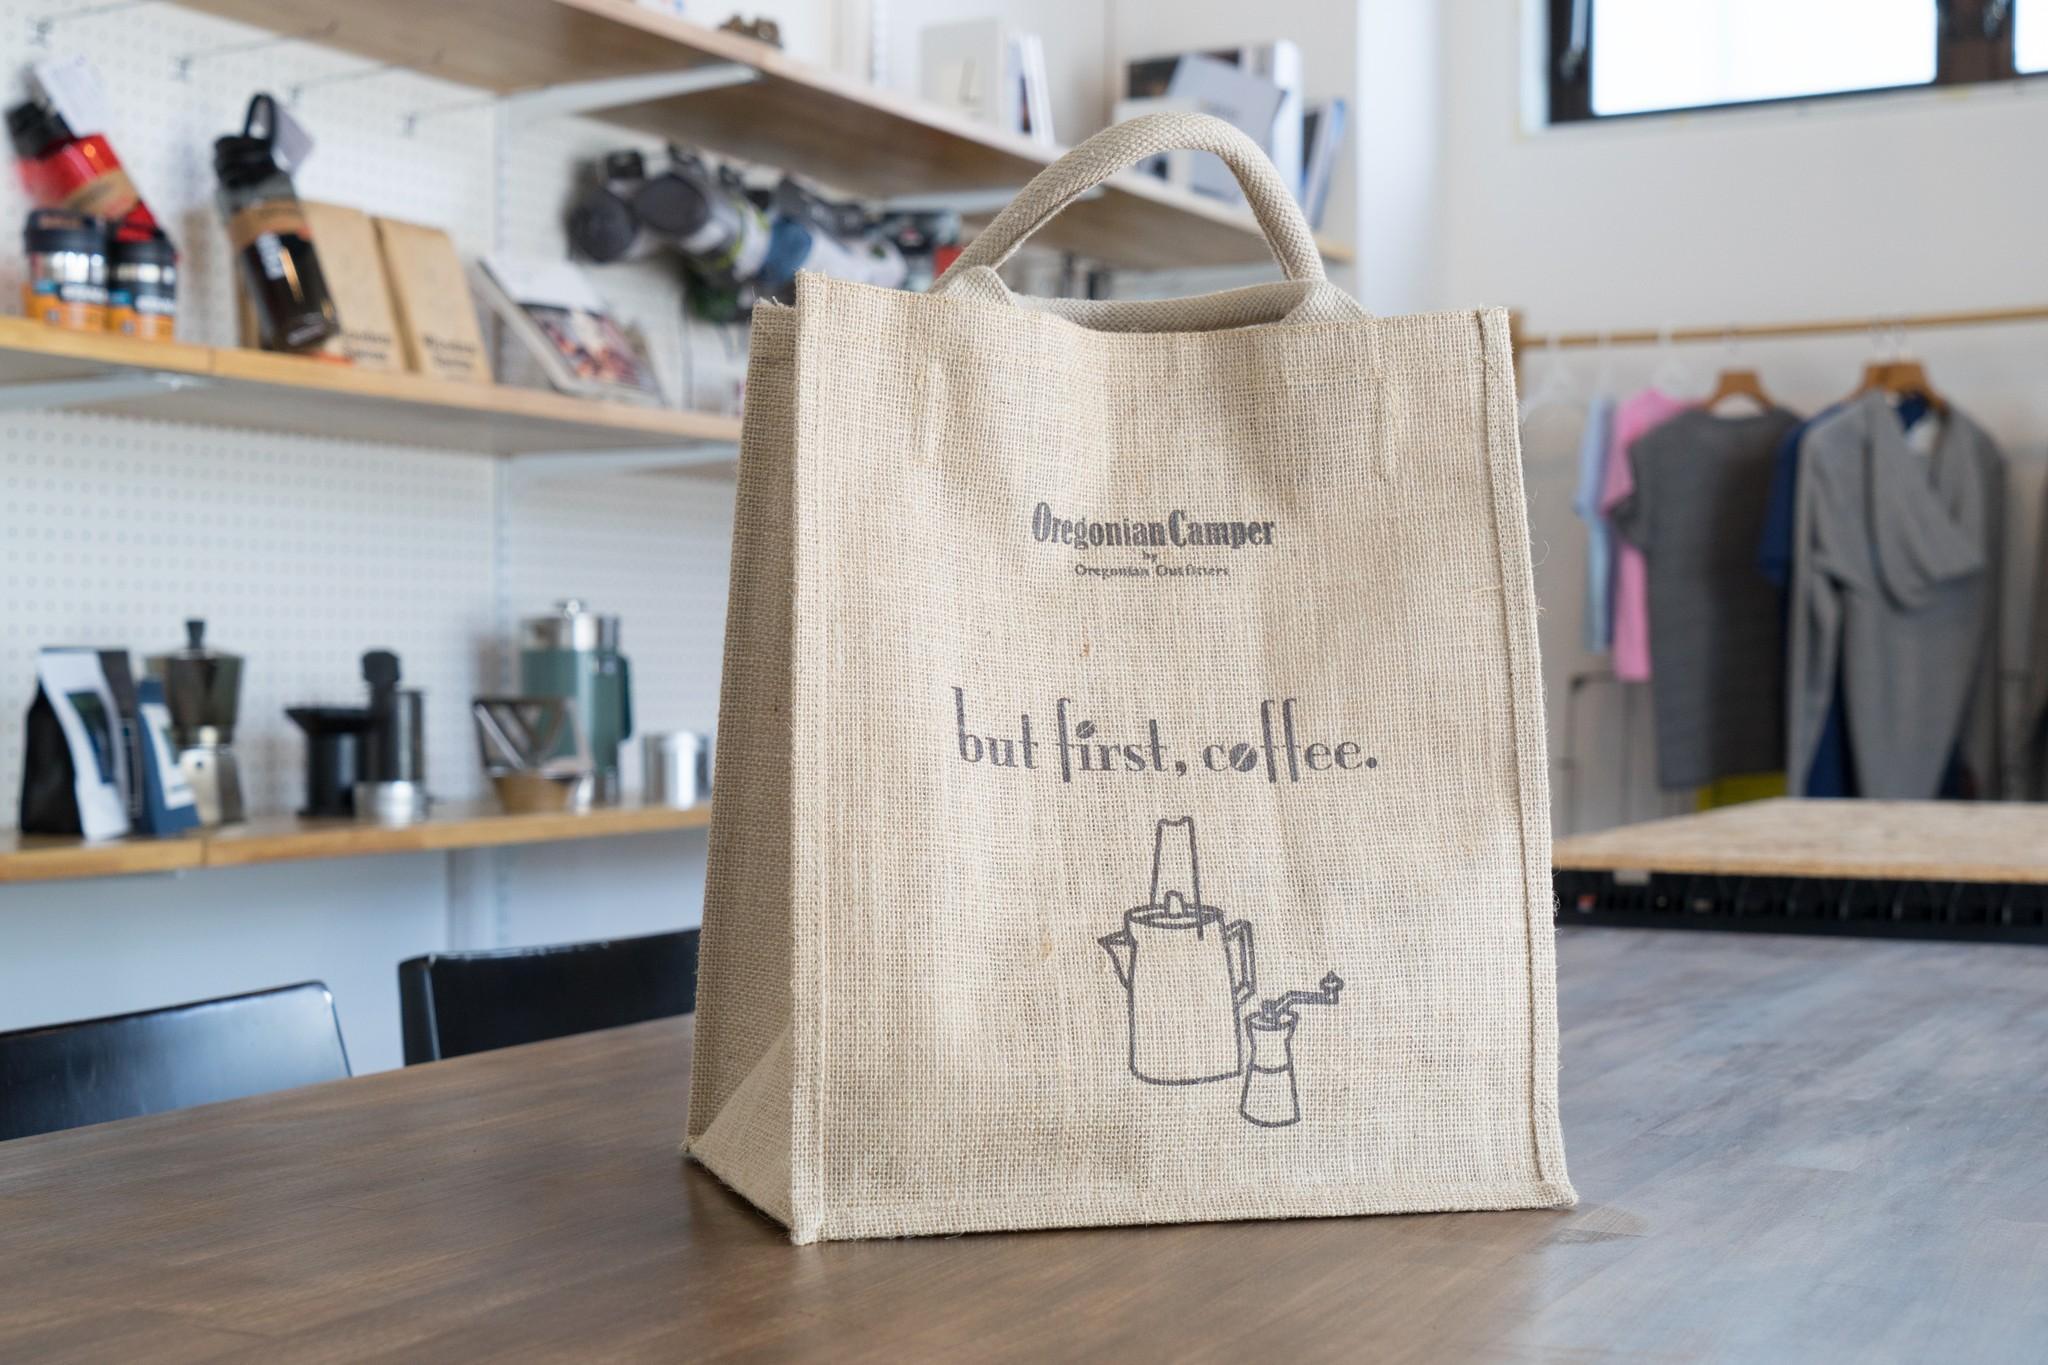 Oregonian Camper ジュートキャリーオールバッグ (Sサイズ) COFFEE 入荷!